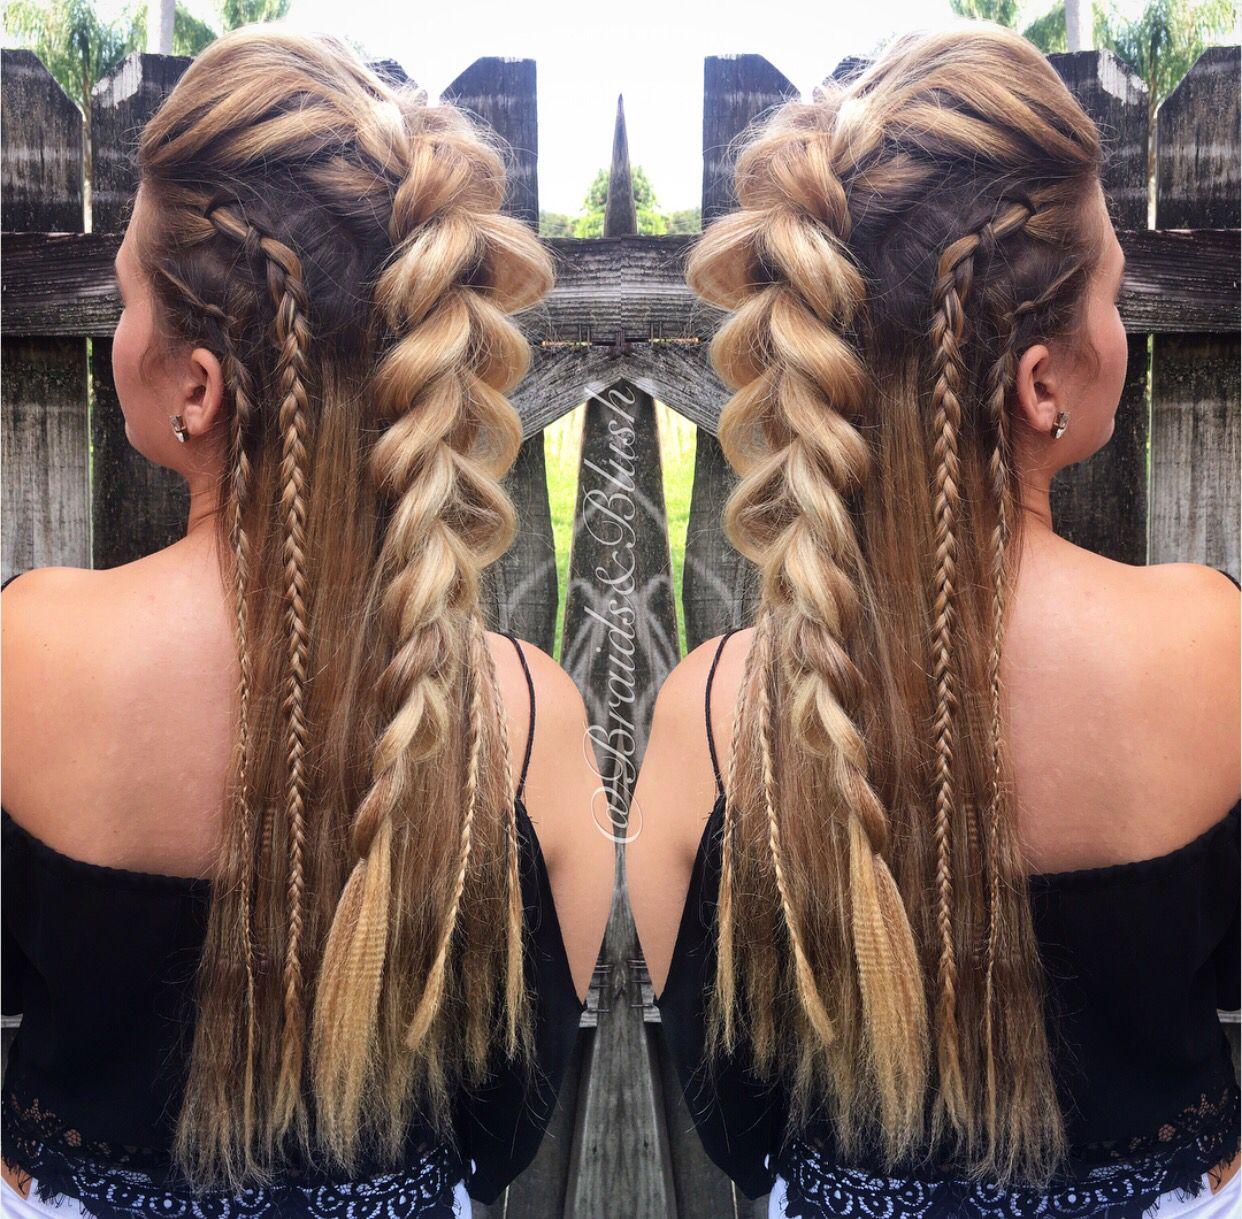 Braidsandblush faux mohawk and side braids festival hair boho up do